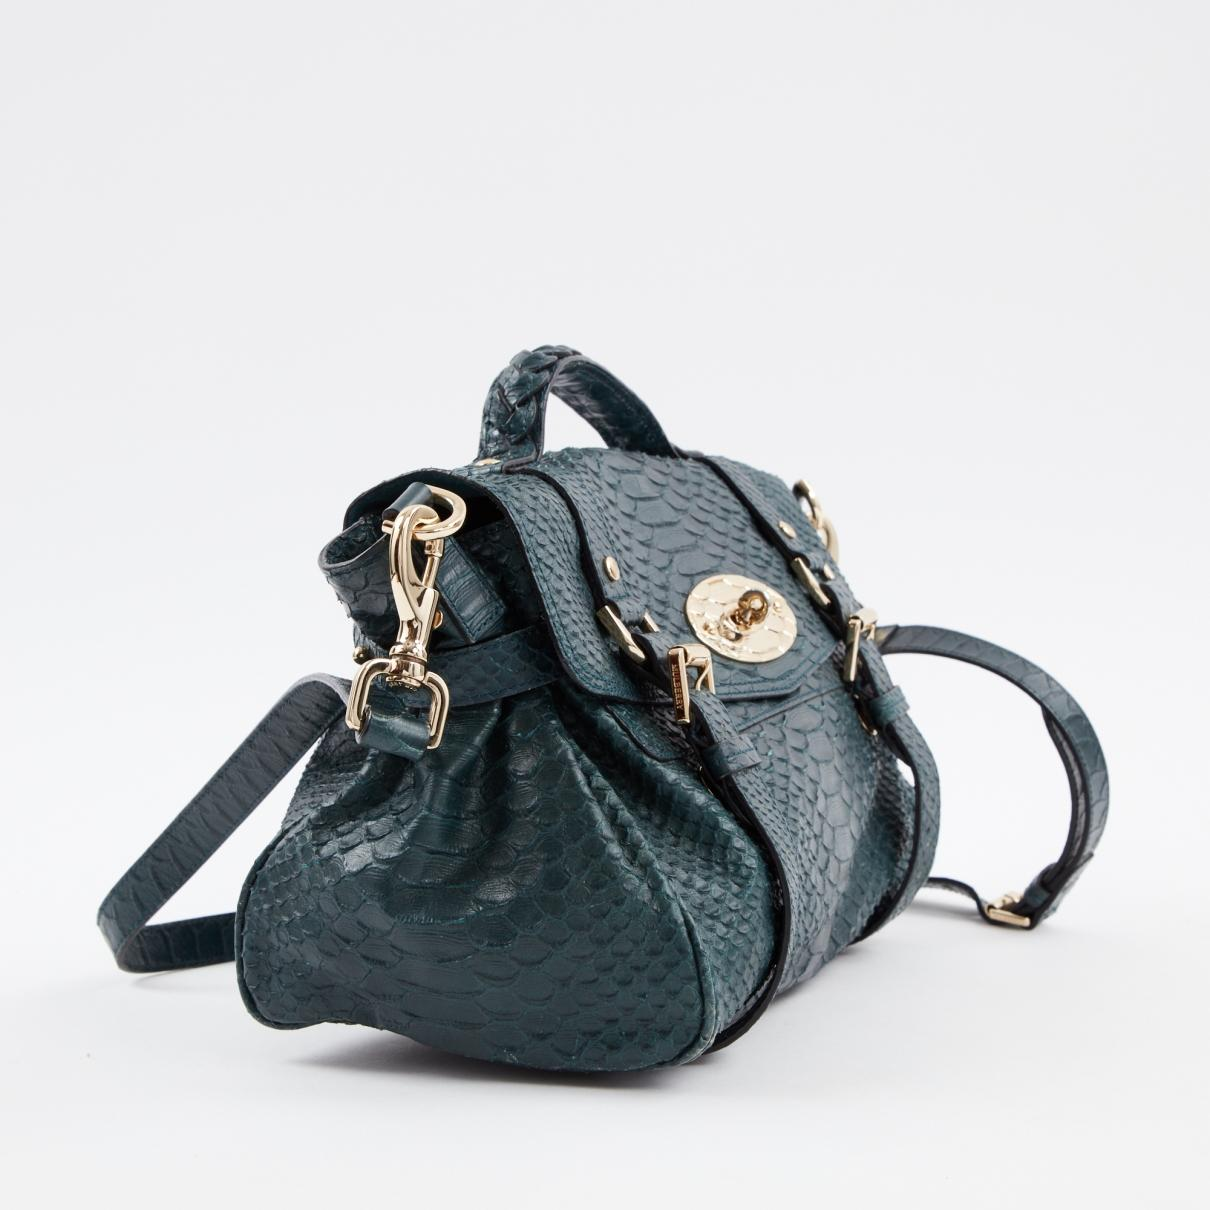 80029817c0e3 Mulberry - Pre-owned Alexa Green Leather Handbags - Lyst. View fullscreen